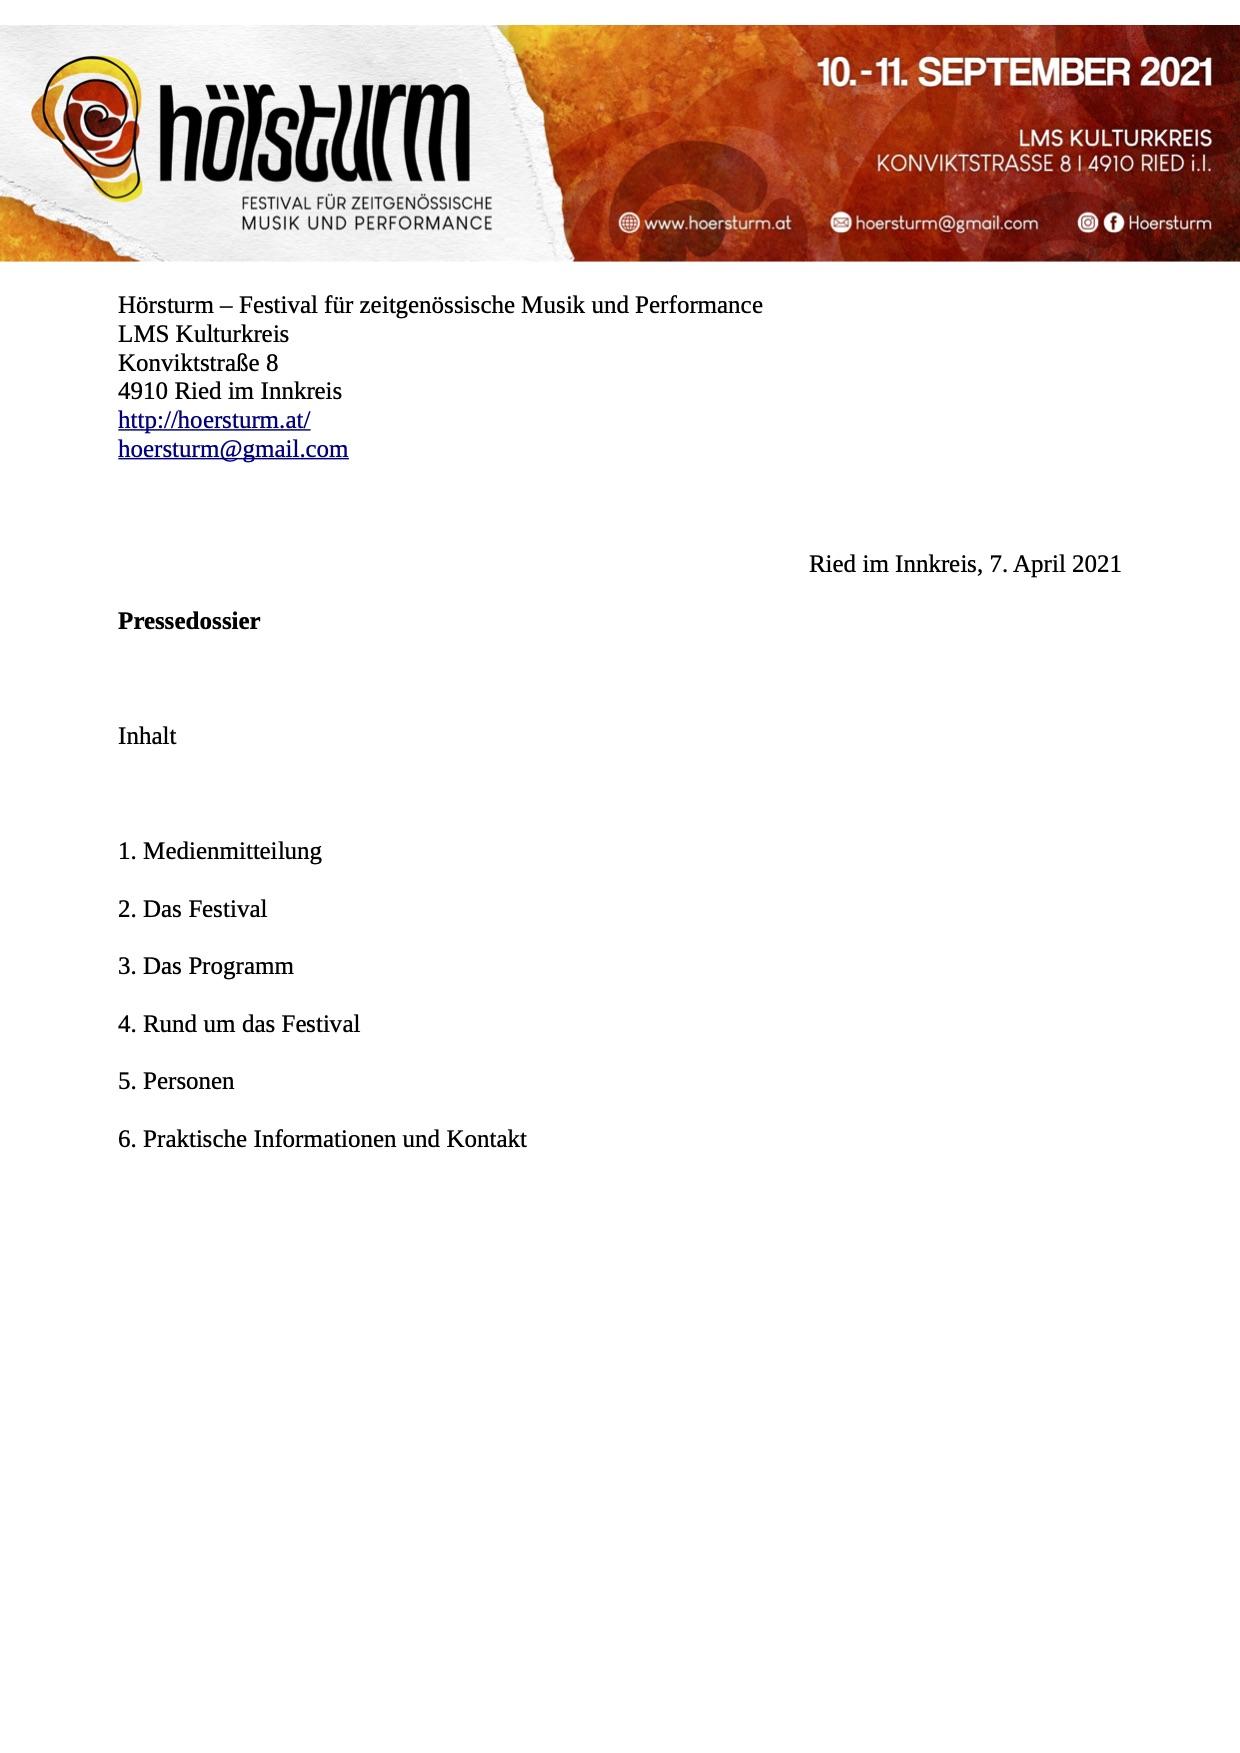 Pressedossier 2021